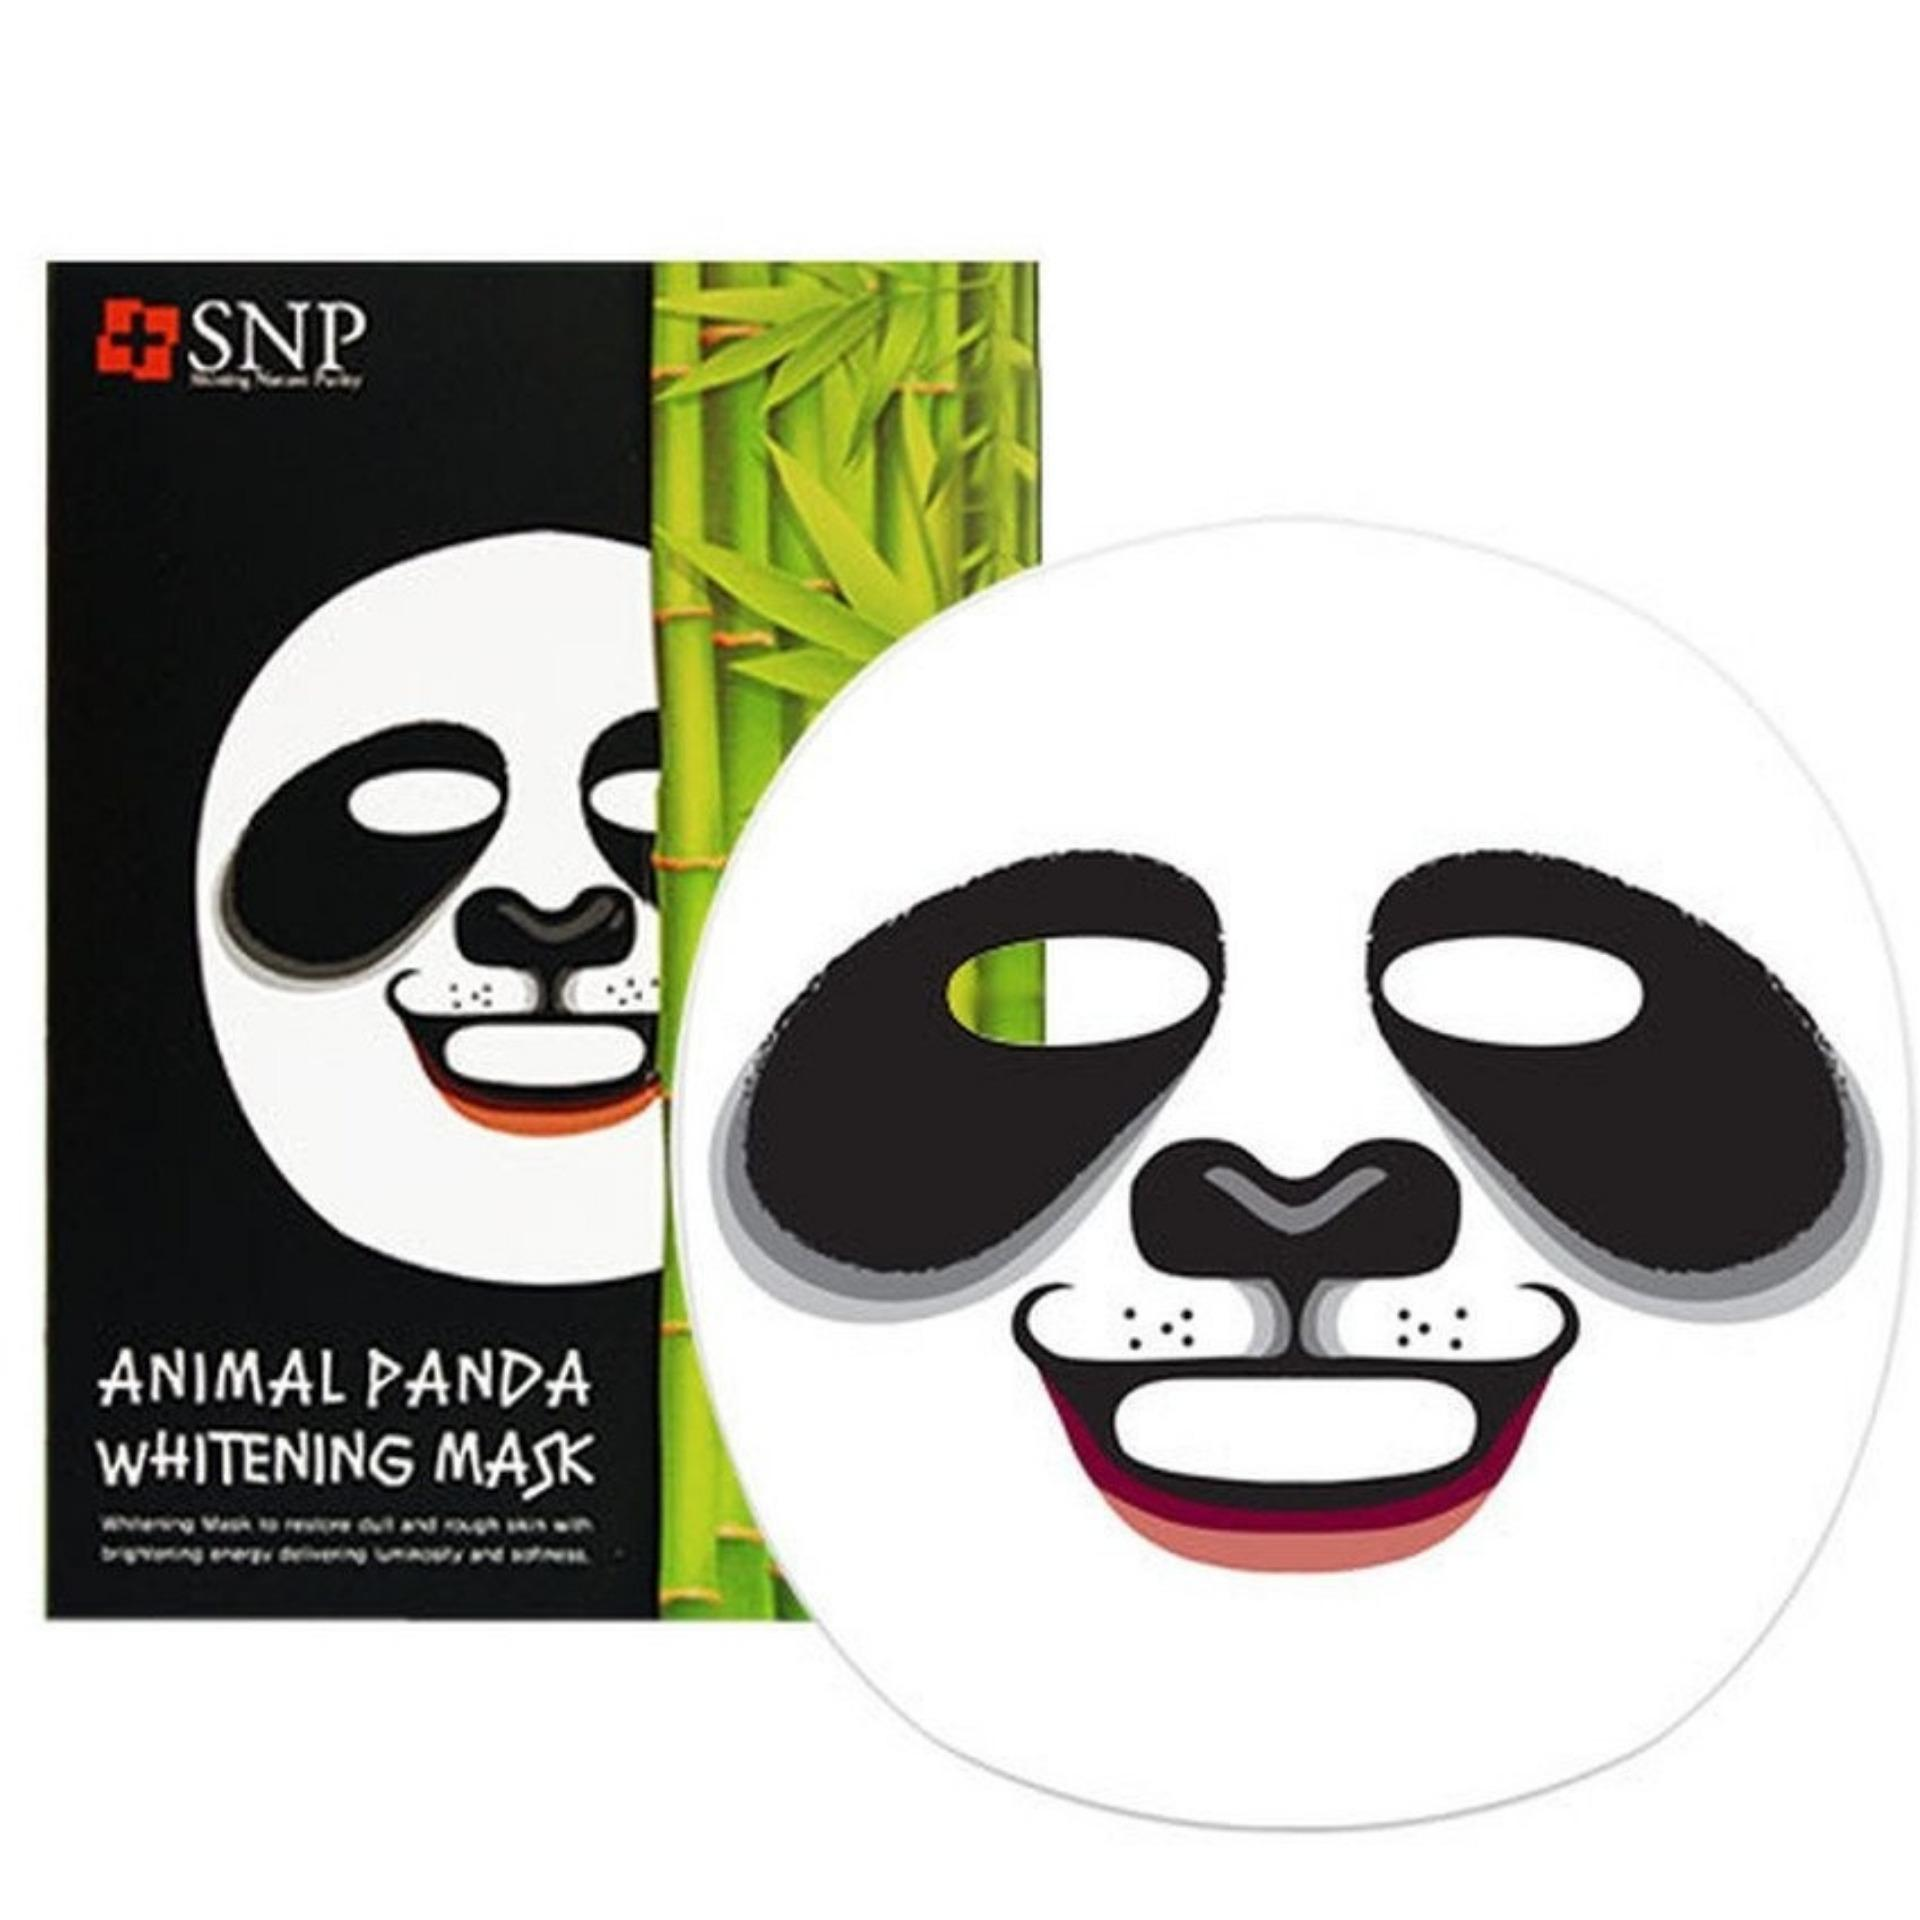 Snp Masker Isi 10 Pcs Wajah Animal Biru Otter Original Daftar Mask Face Flash Sale Sheet 1pc